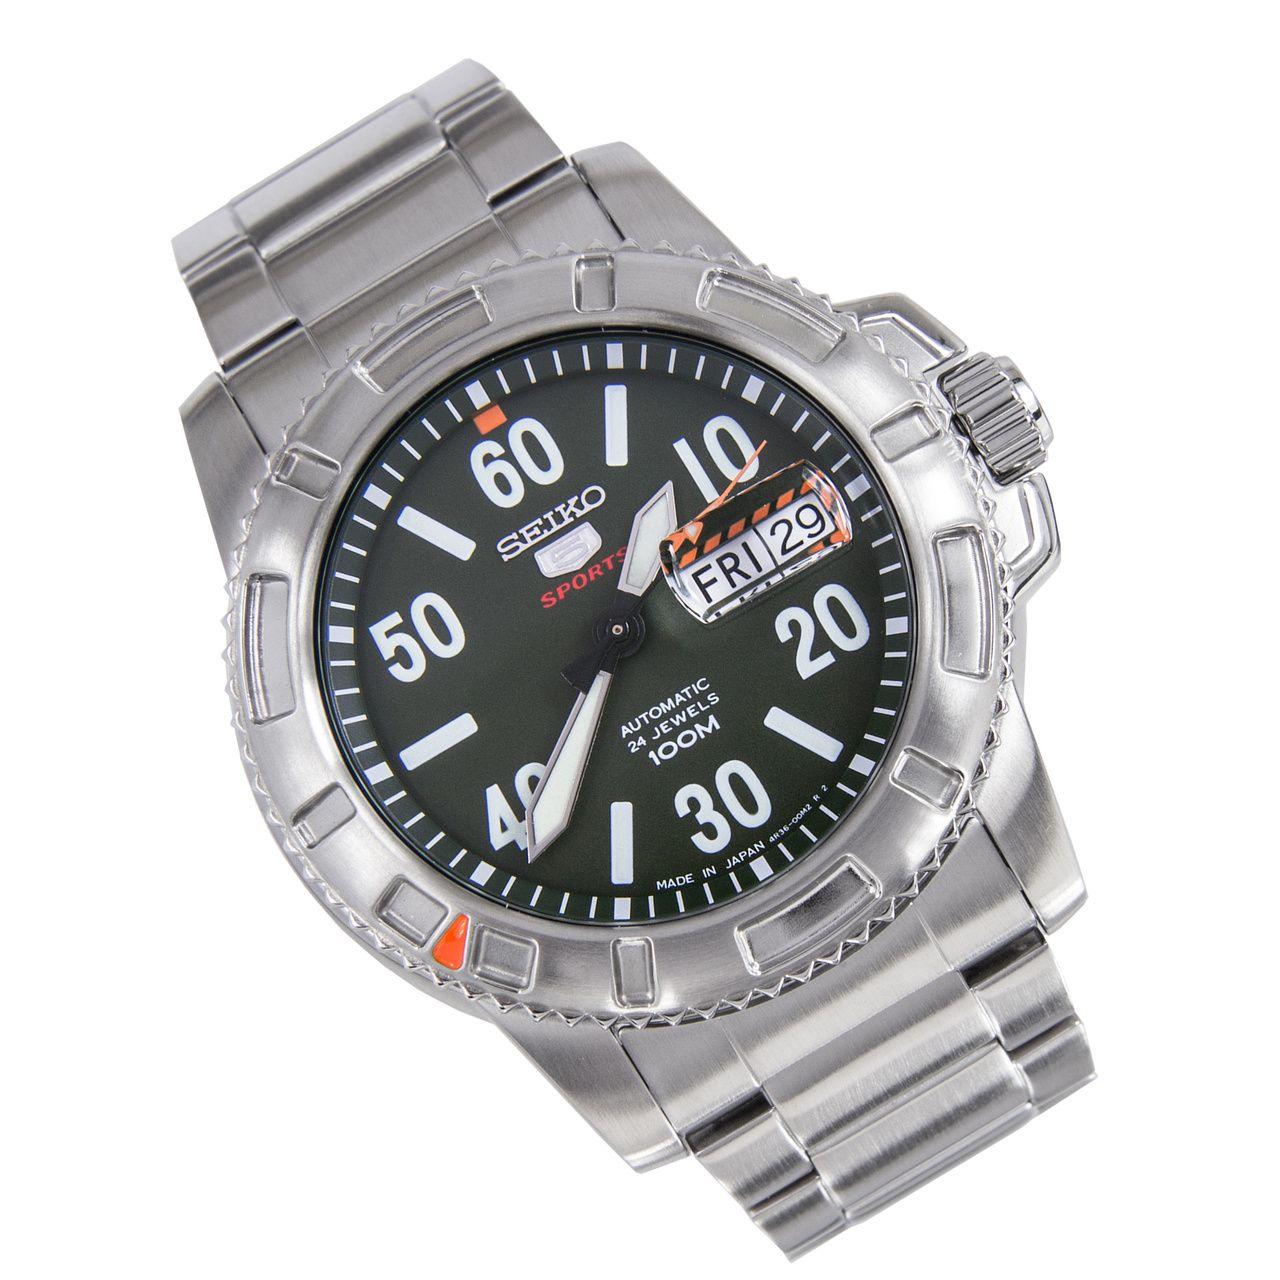 Seiko 5 Sports Automatic Watch SRP215J1 SRP215J SRP215